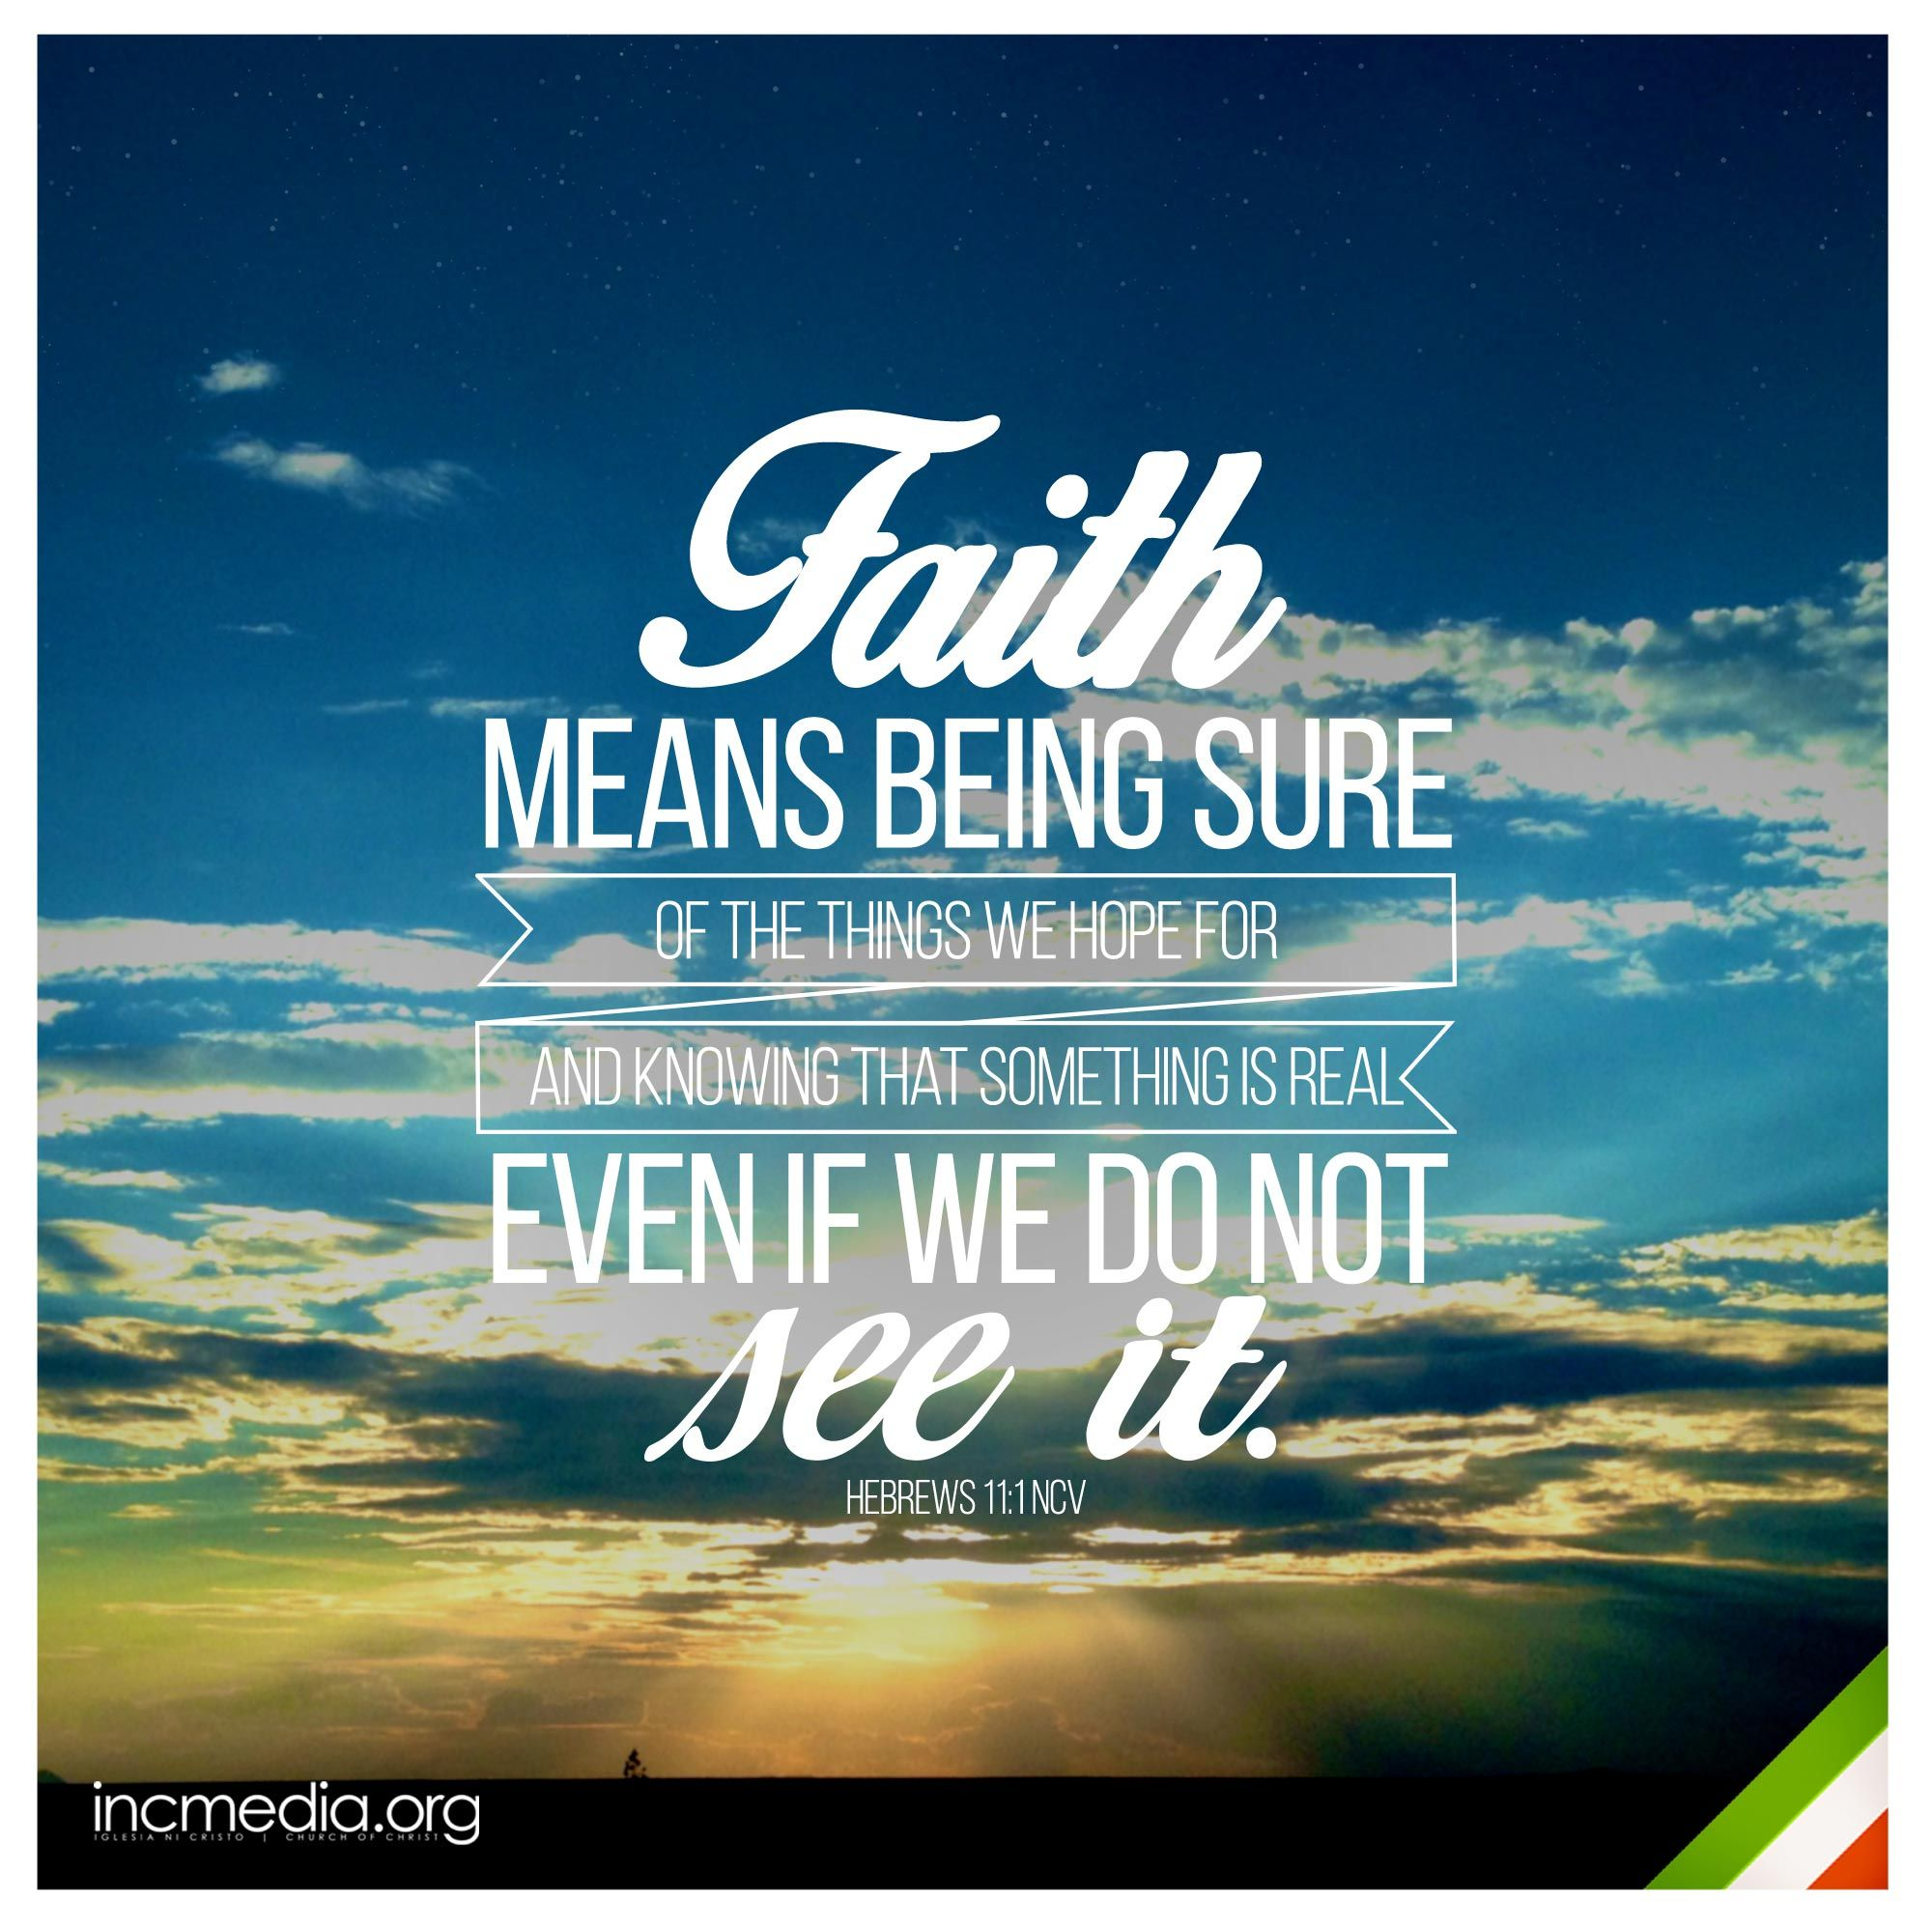 Hebrews 11 1 Ncv